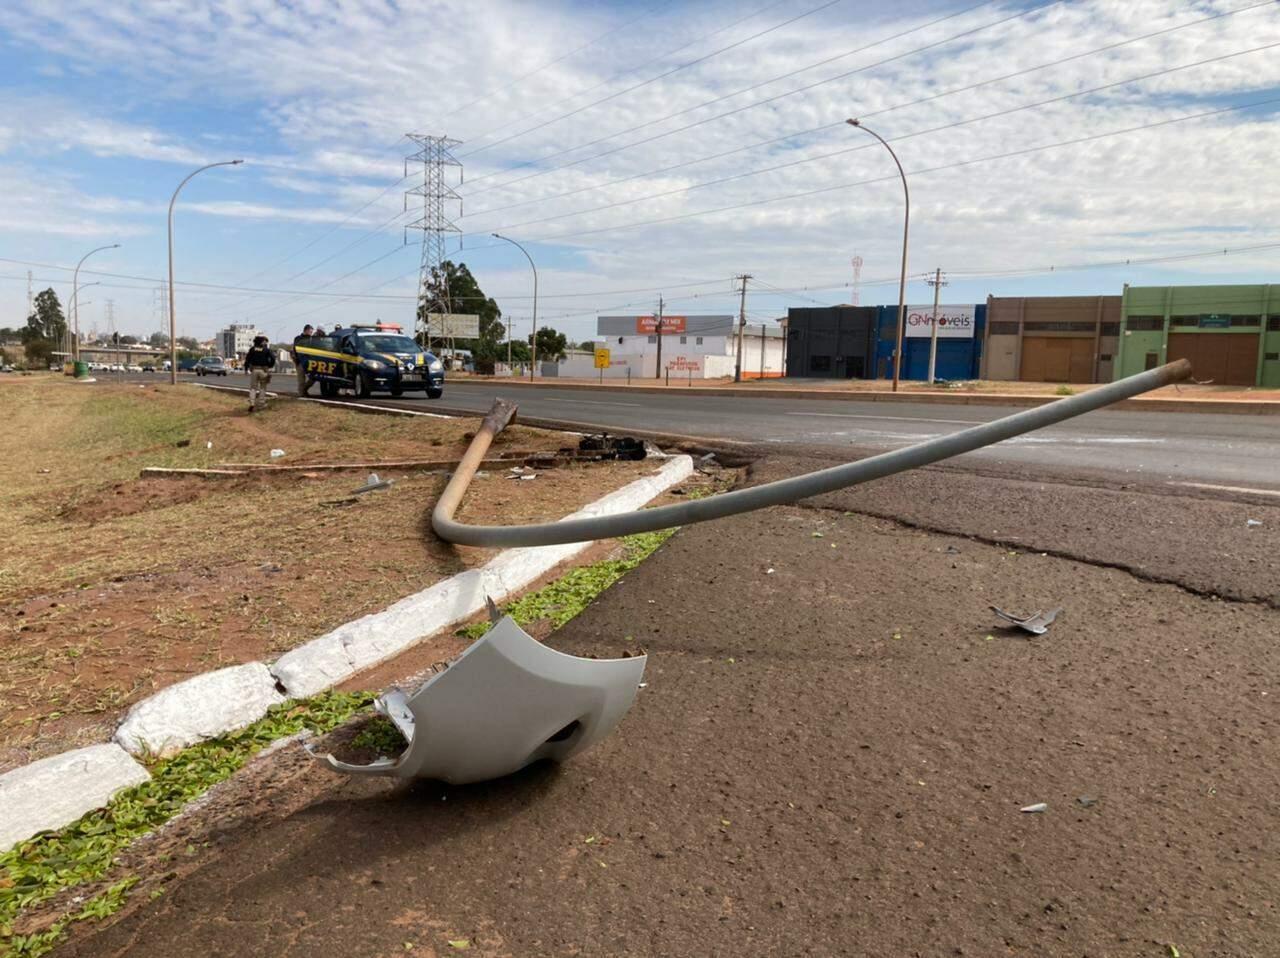 Poste de luz foi derrubado pelo condutor (Foto: Mariely Barros)